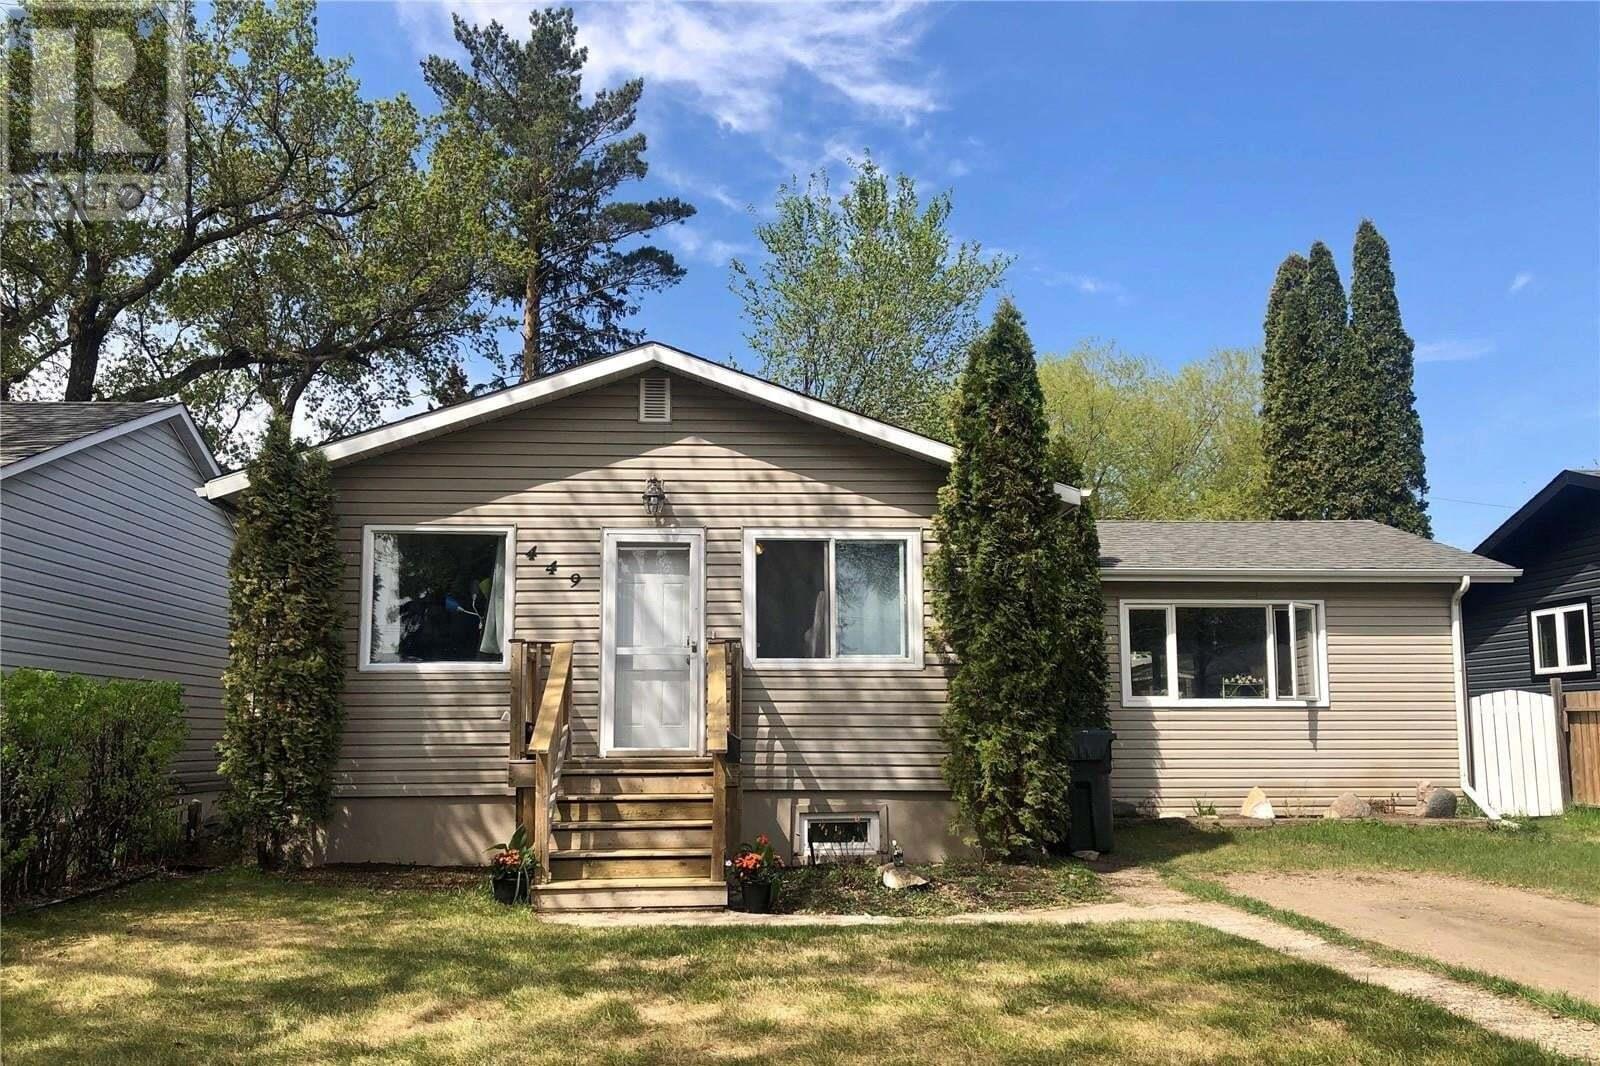 House for sale at 449 V Ave S Saskatoon Saskatchewan - MLS: SK809362